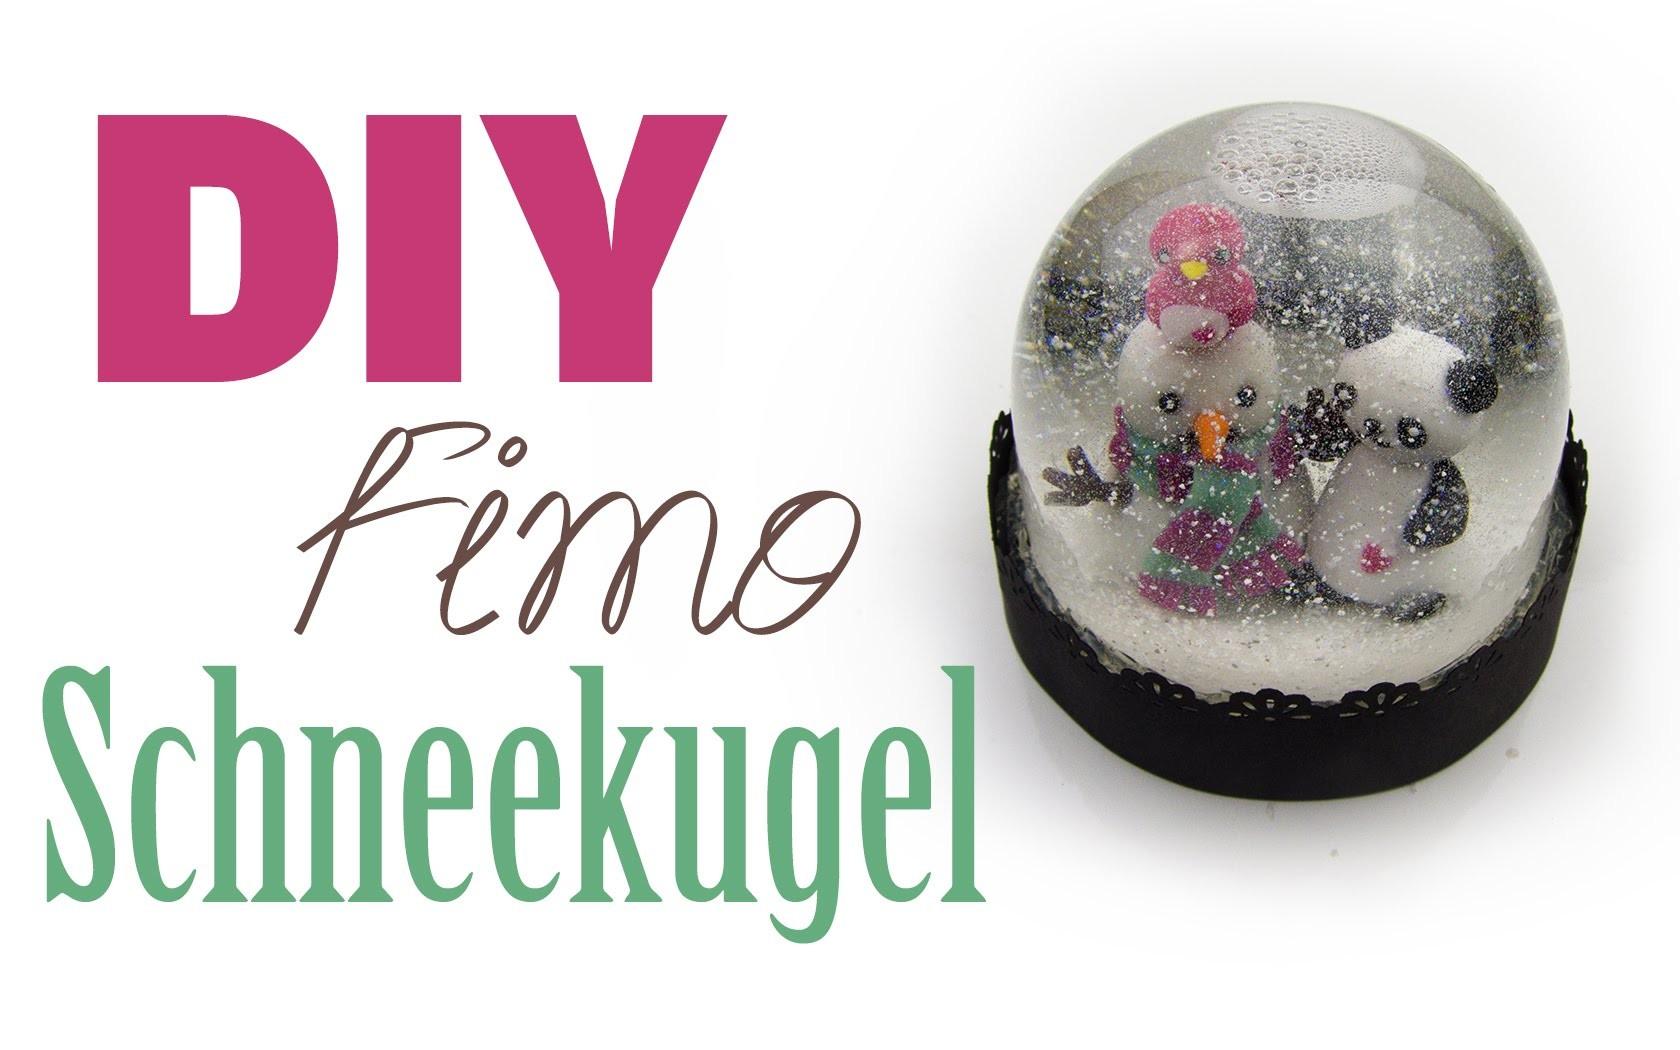 fimo schneekugel diy geschenk ideen 05 weihnachts serie. Black Bedroom Furniture Sets. Home Design Ideas